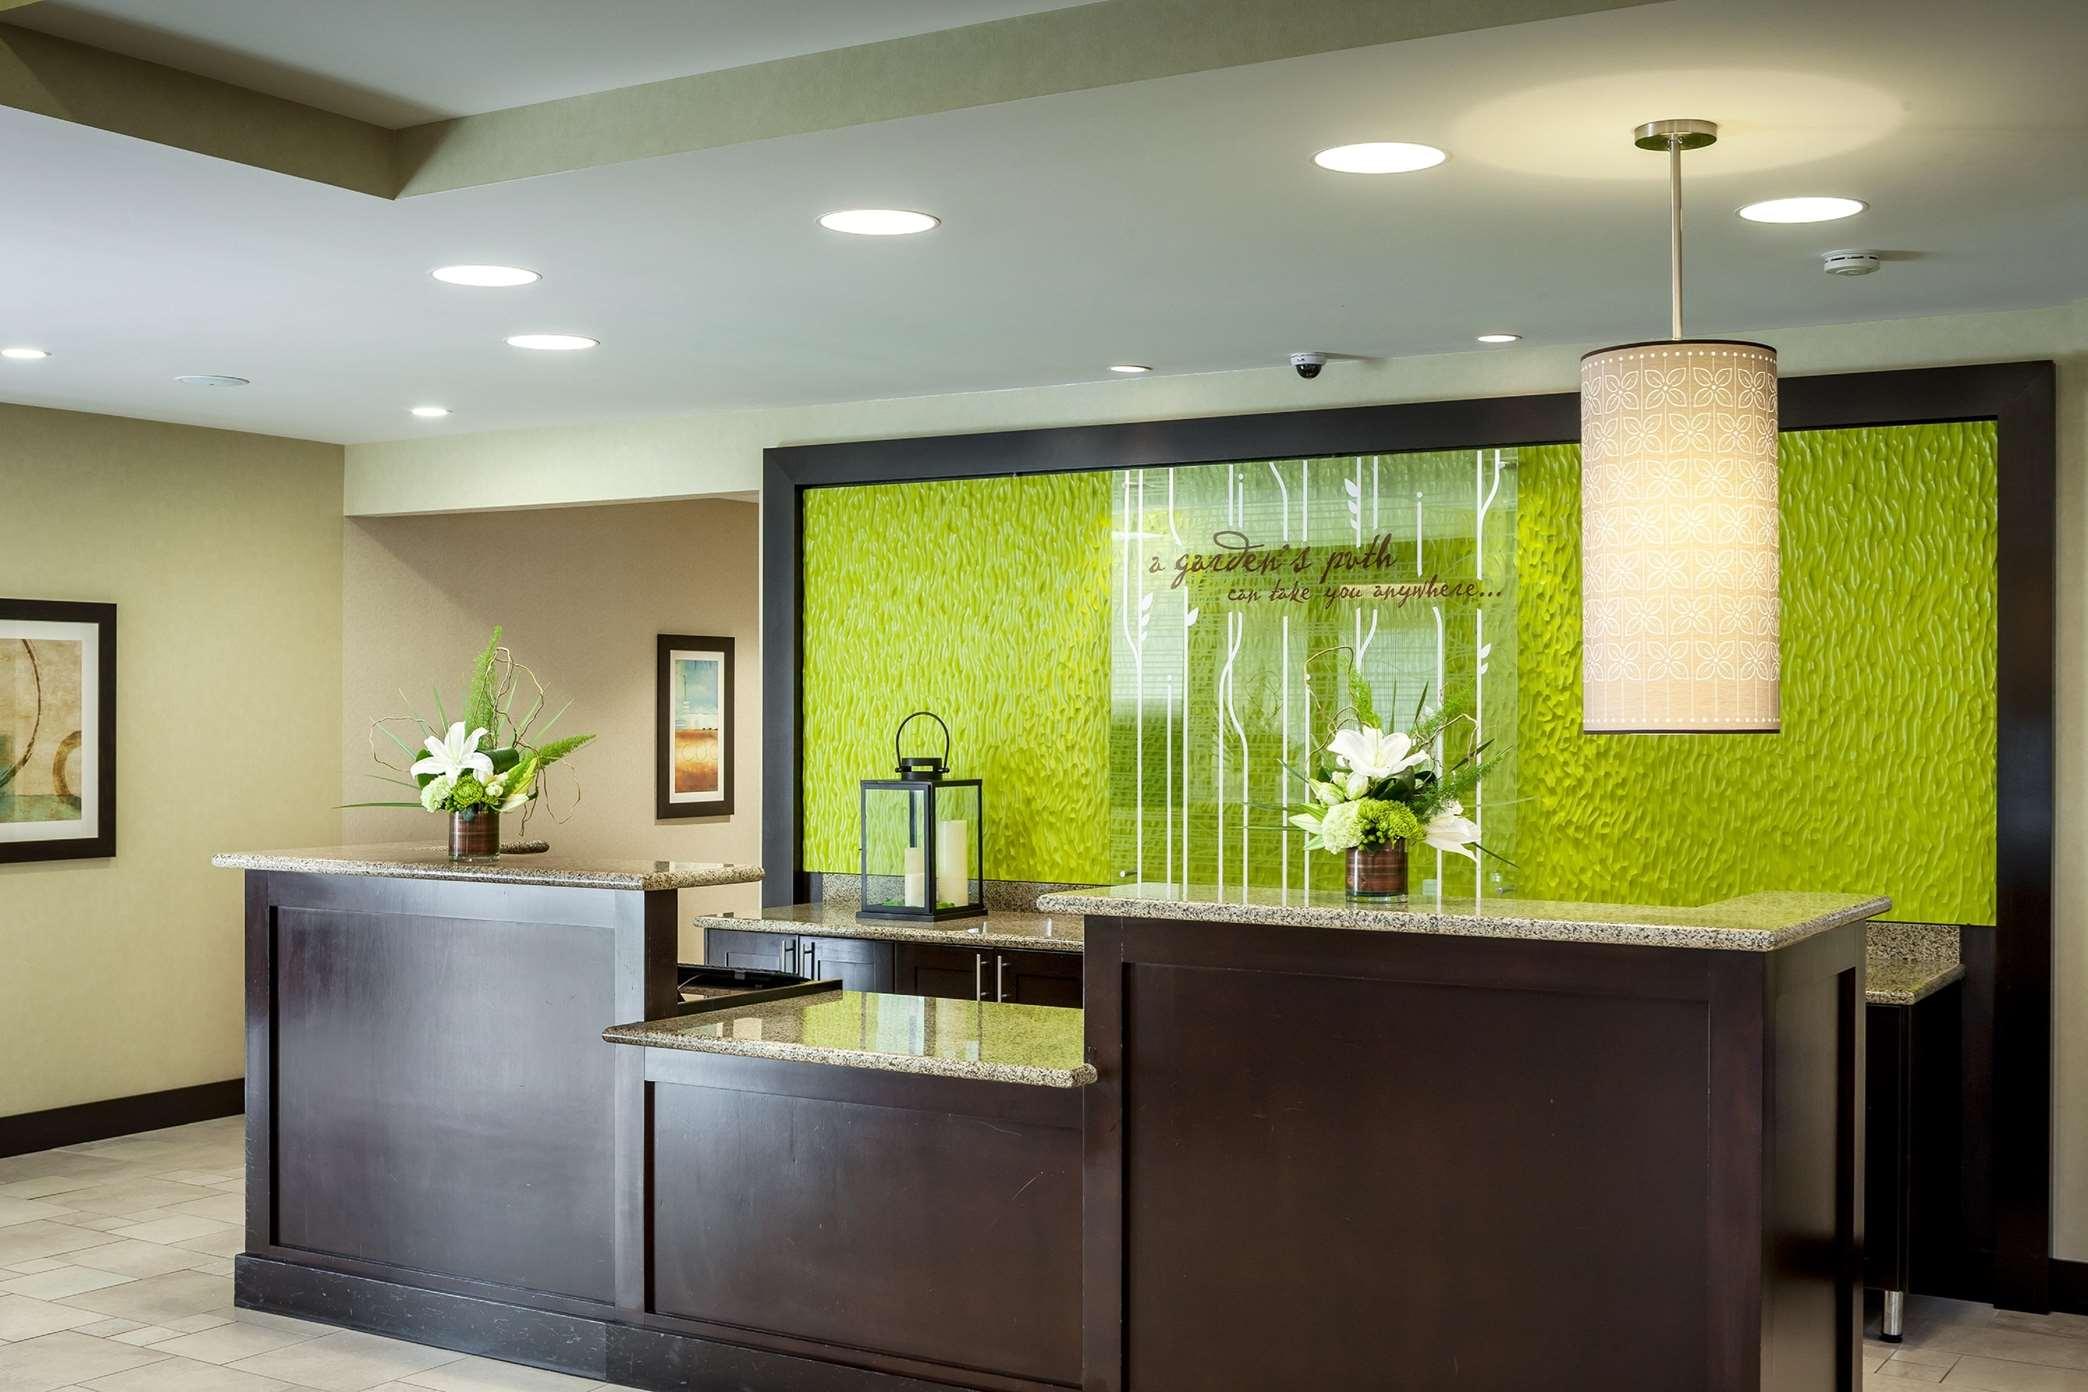 Awesome Reviews Of Hilton Garden Inn Seattle/Bothell, WA